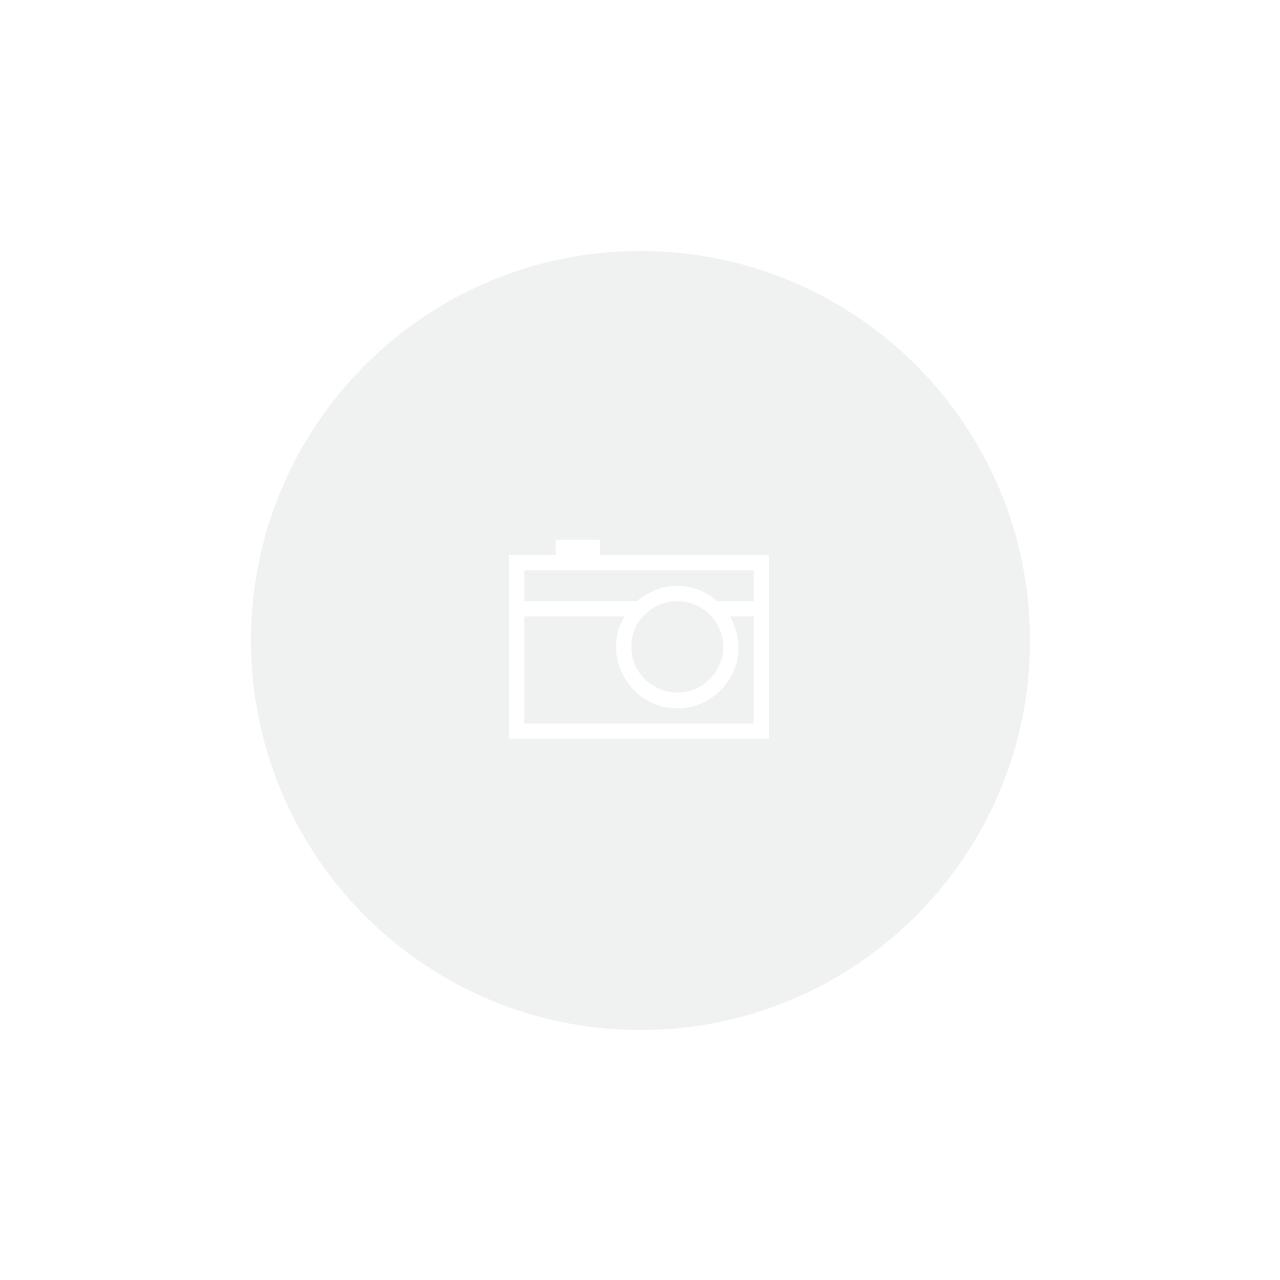 Gola de Tricot Peluda 069IF16